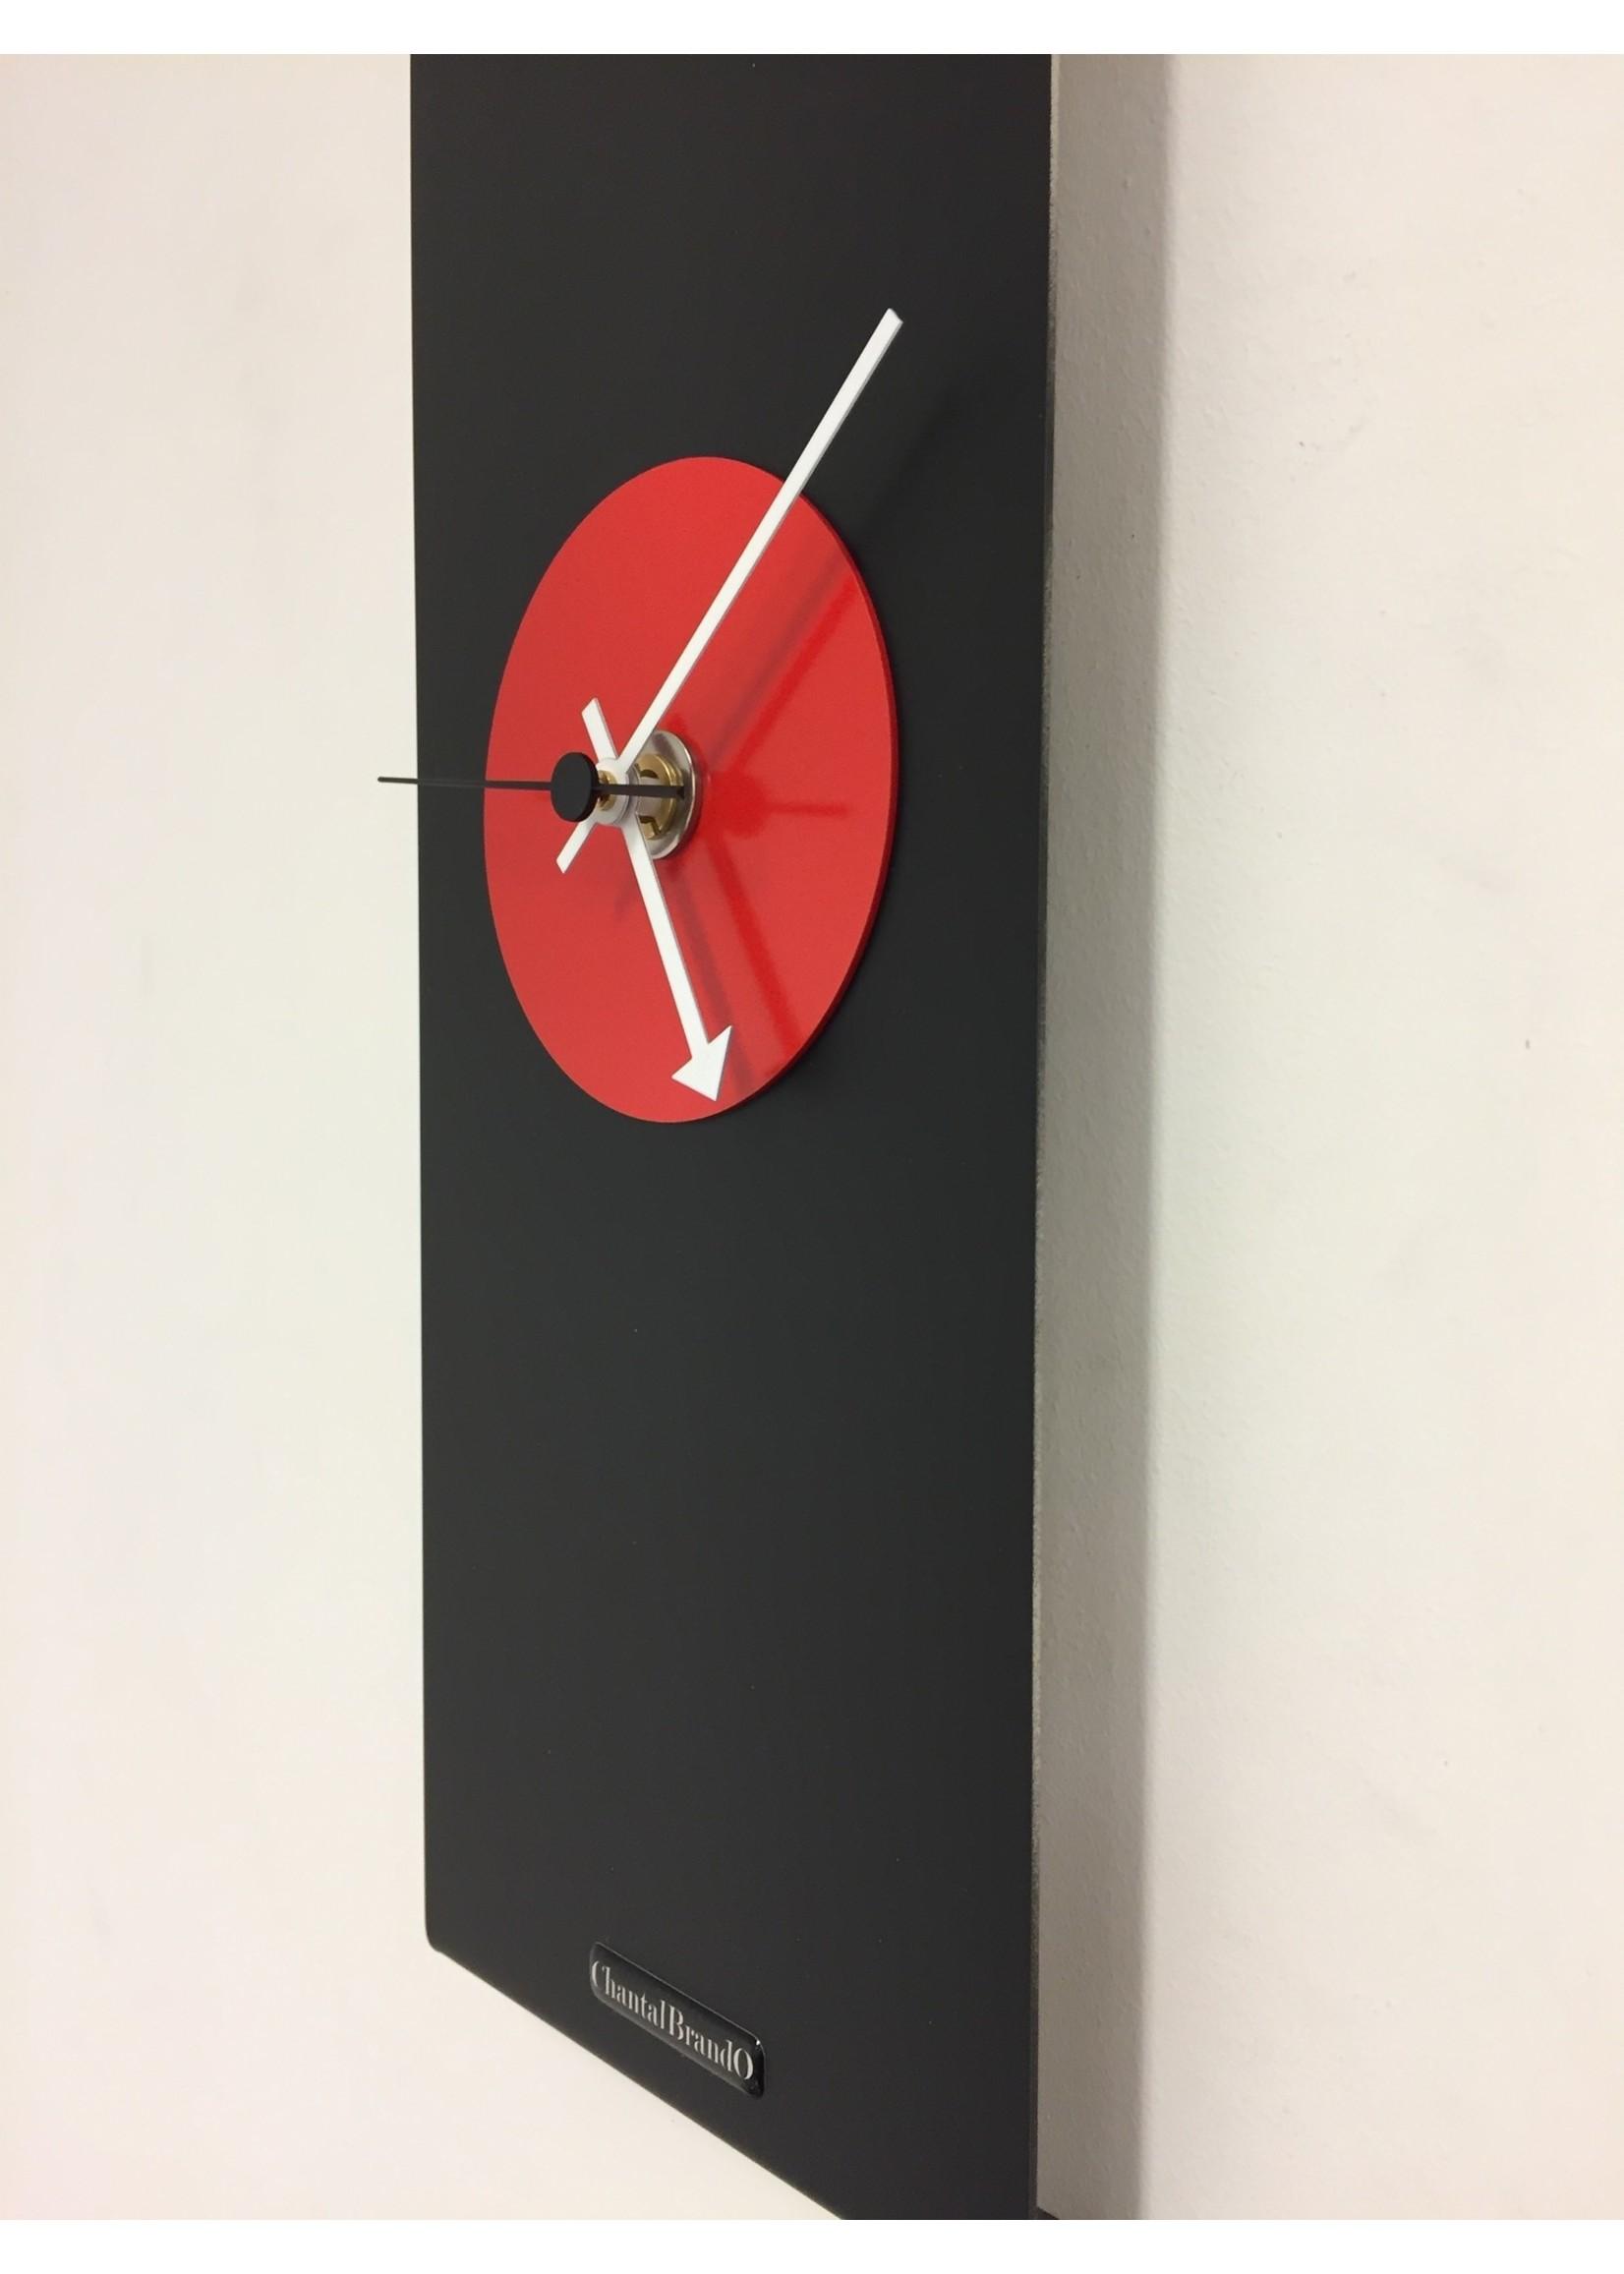 Klokkendiscounter Wandklok Black-Line & RED Modern Design RVS